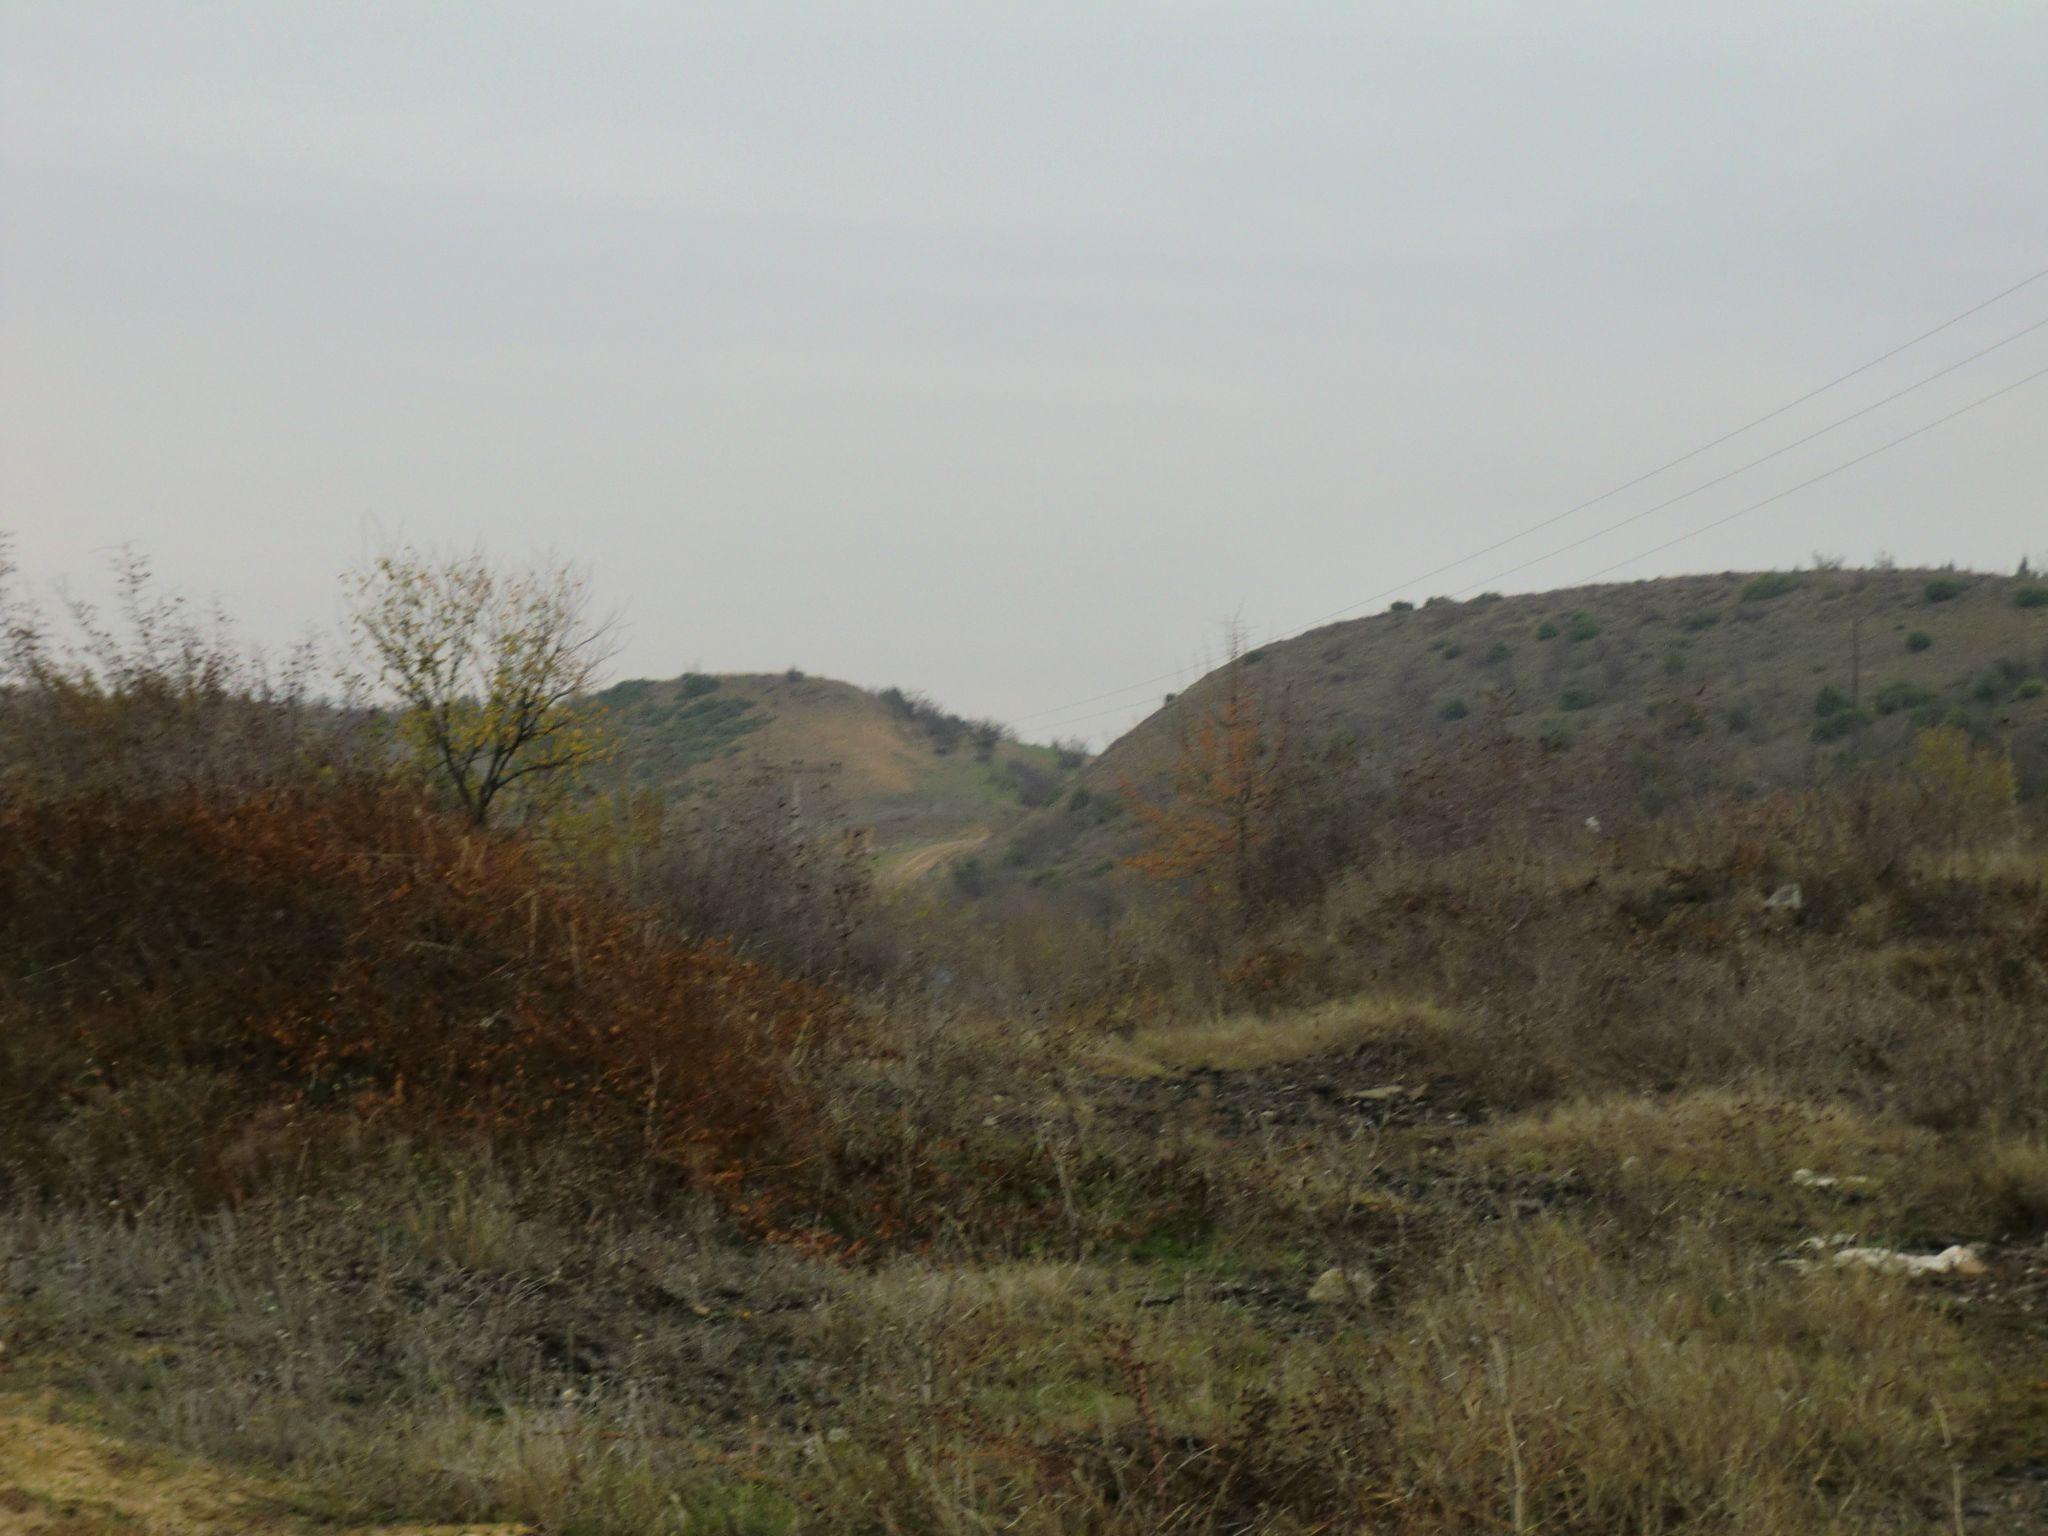 CIMG0303 - Macedonian landscapes